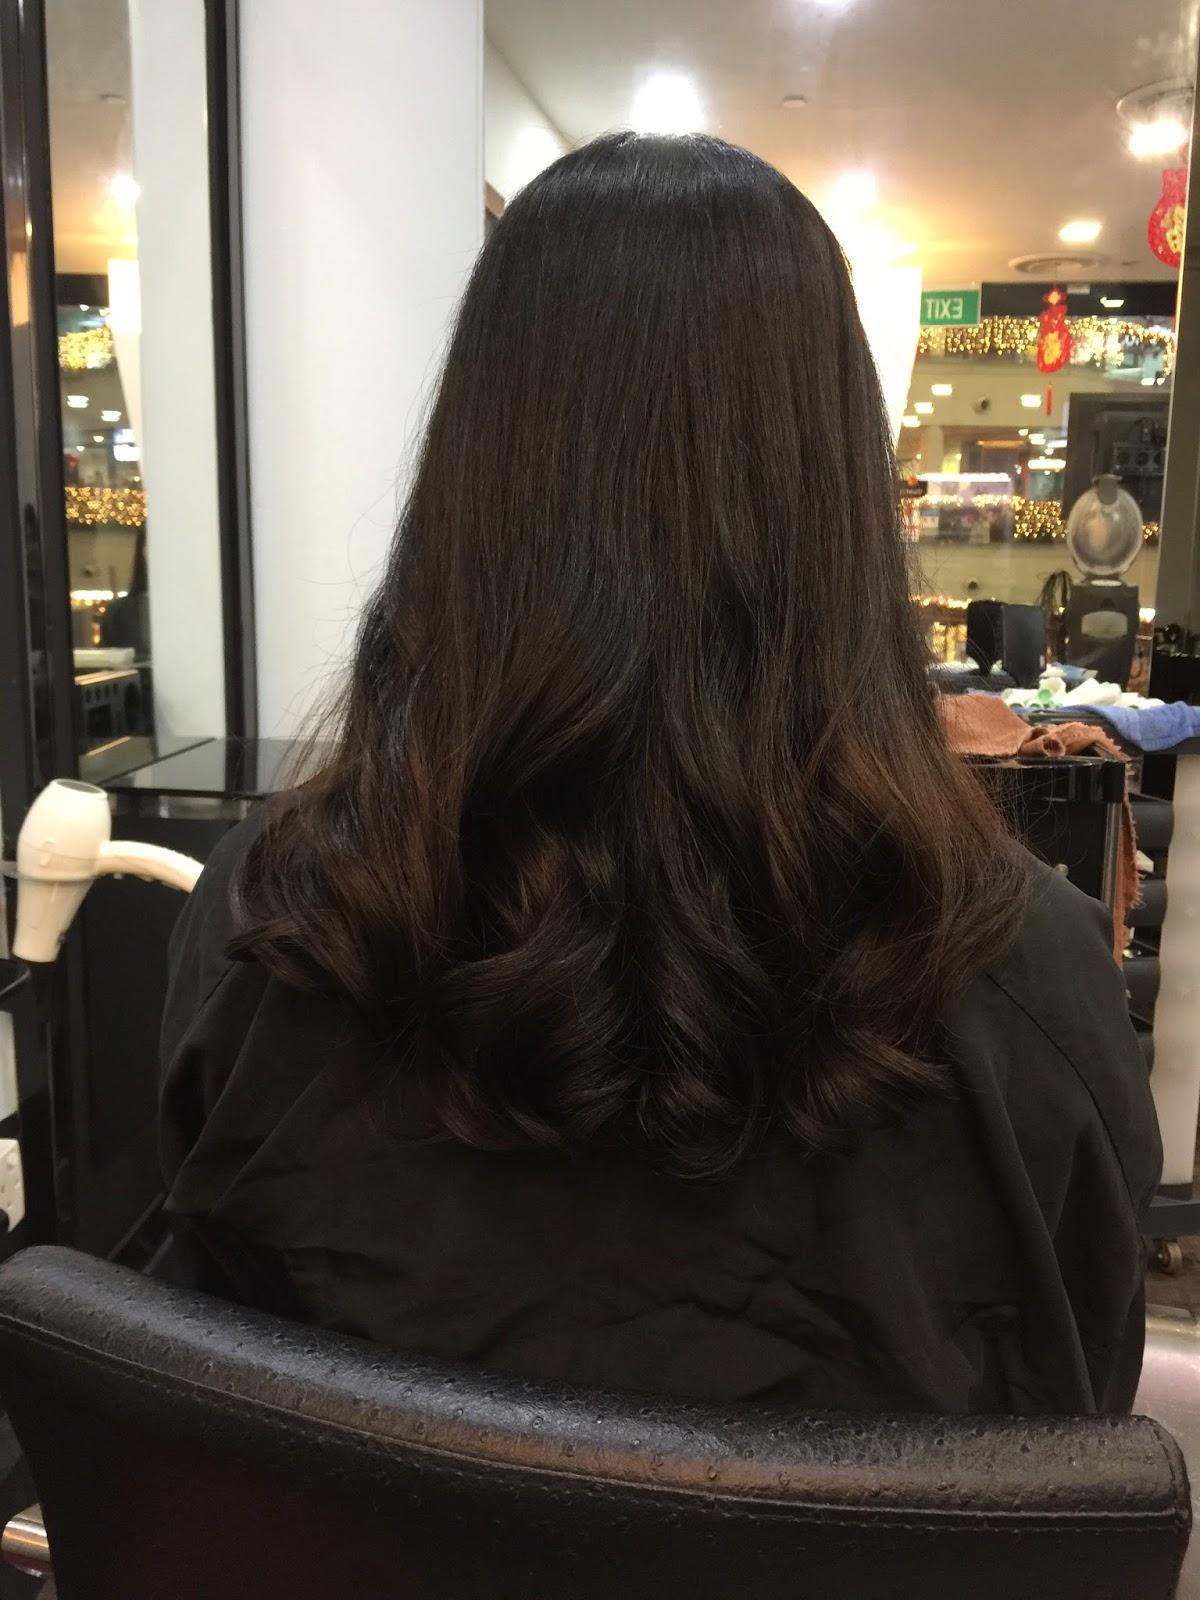 Digital Perm Naturally Curly Hair